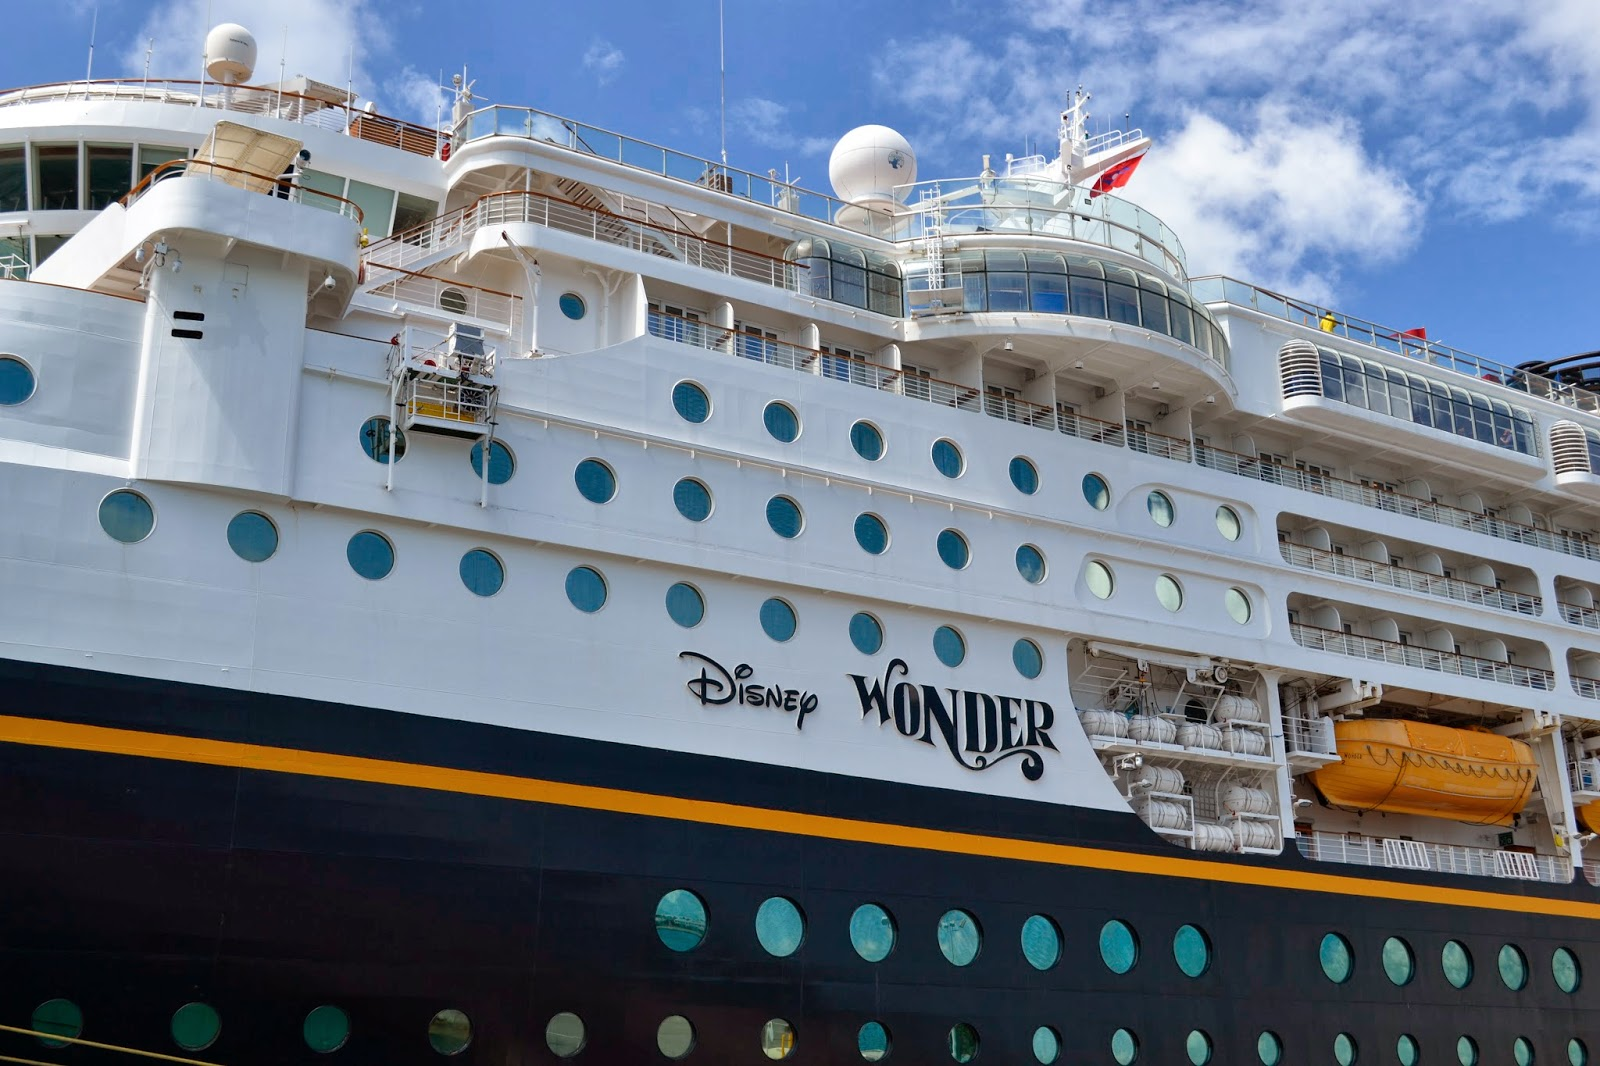 YOuR LiTtLe BiRdiE Disney Cruise Tips Tricks - Cruise ship tricks